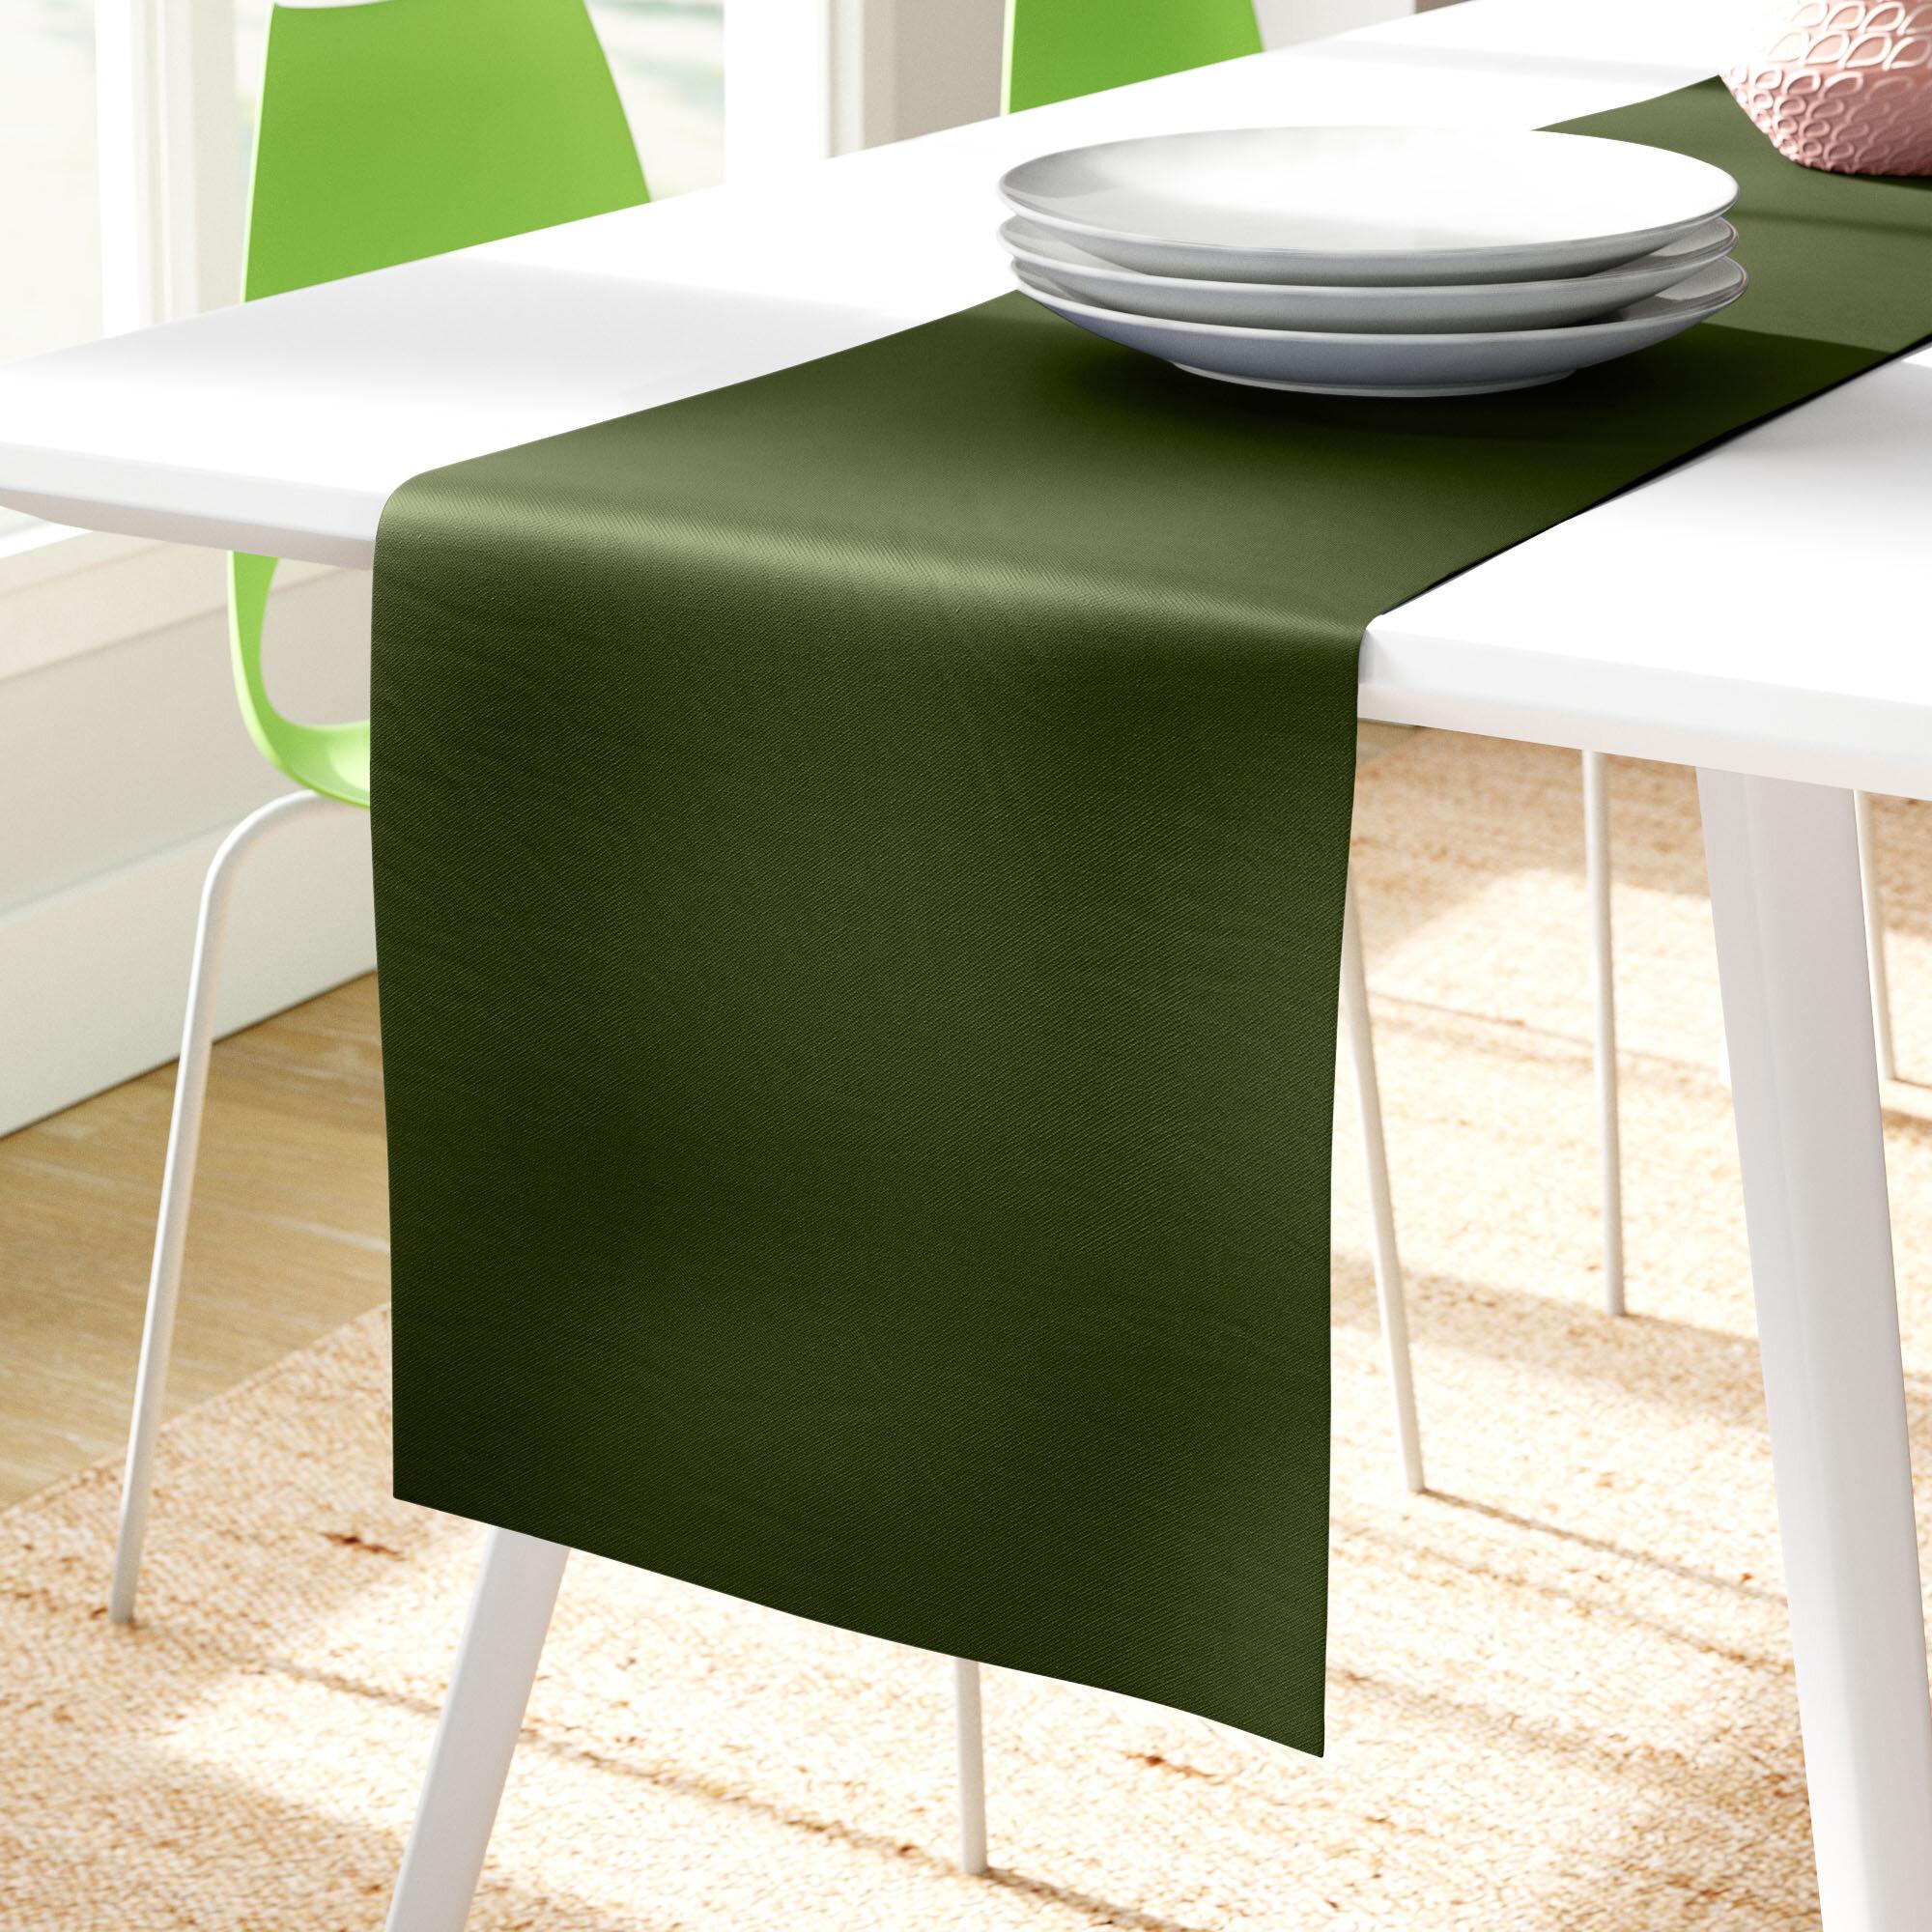 Reversible Table Runner Table Linens You Ll Love In 2021 Wayfair